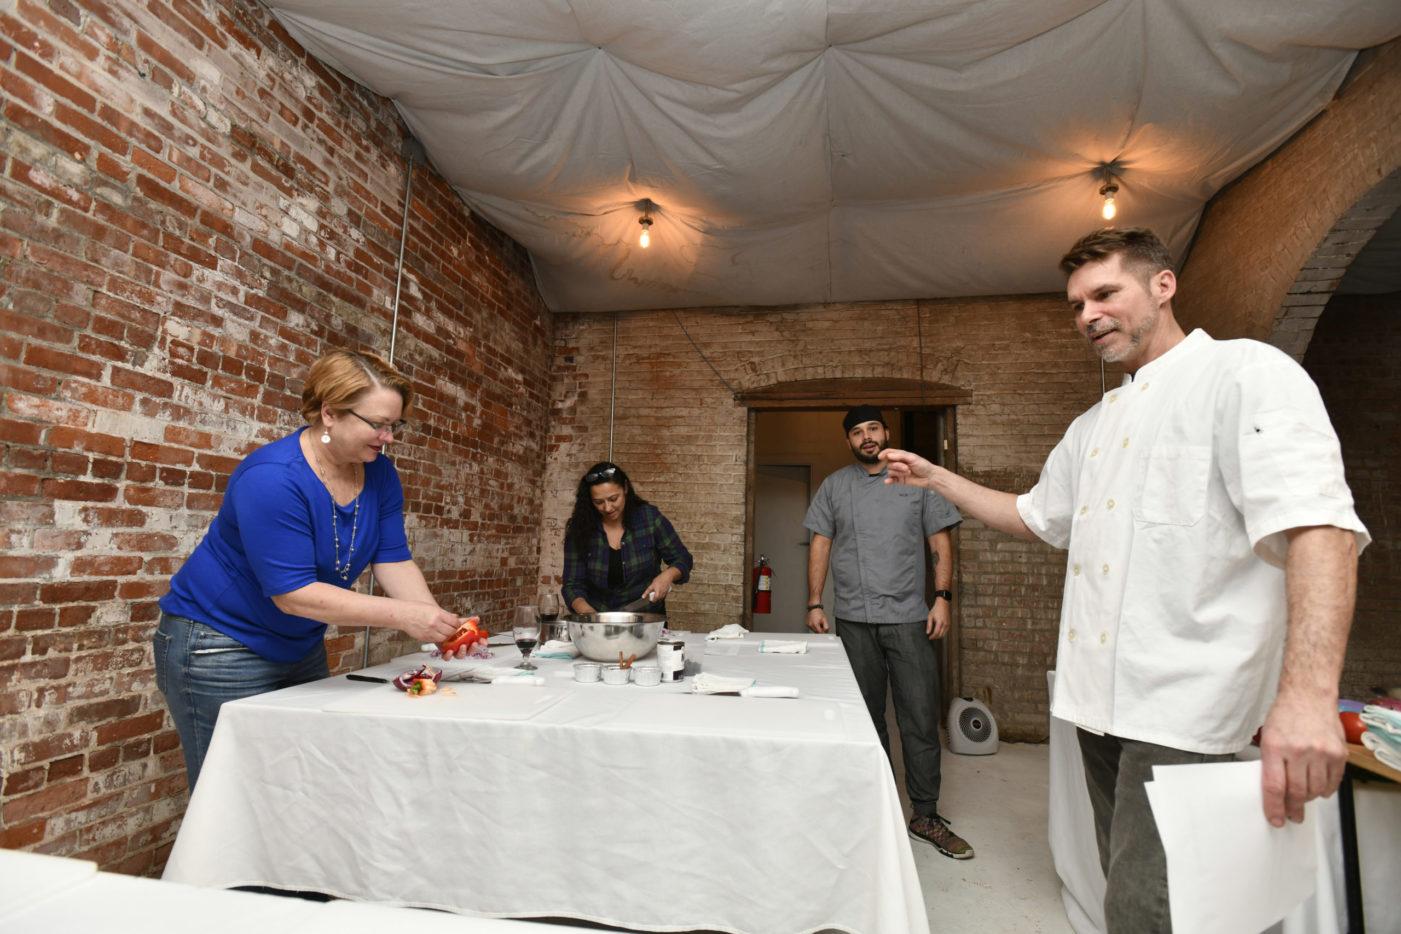 Chefs Nicolas Reisini and Jon Albrecht work with students Lisa Westfall and Marilyn Cruz.